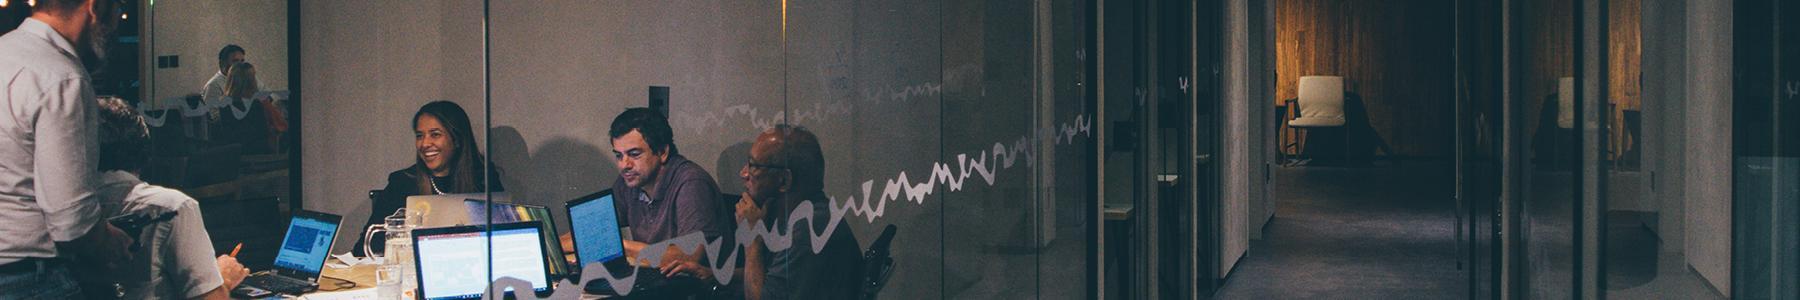 Thomas Morr: Why I Became A Financial Advisor Thumbnail